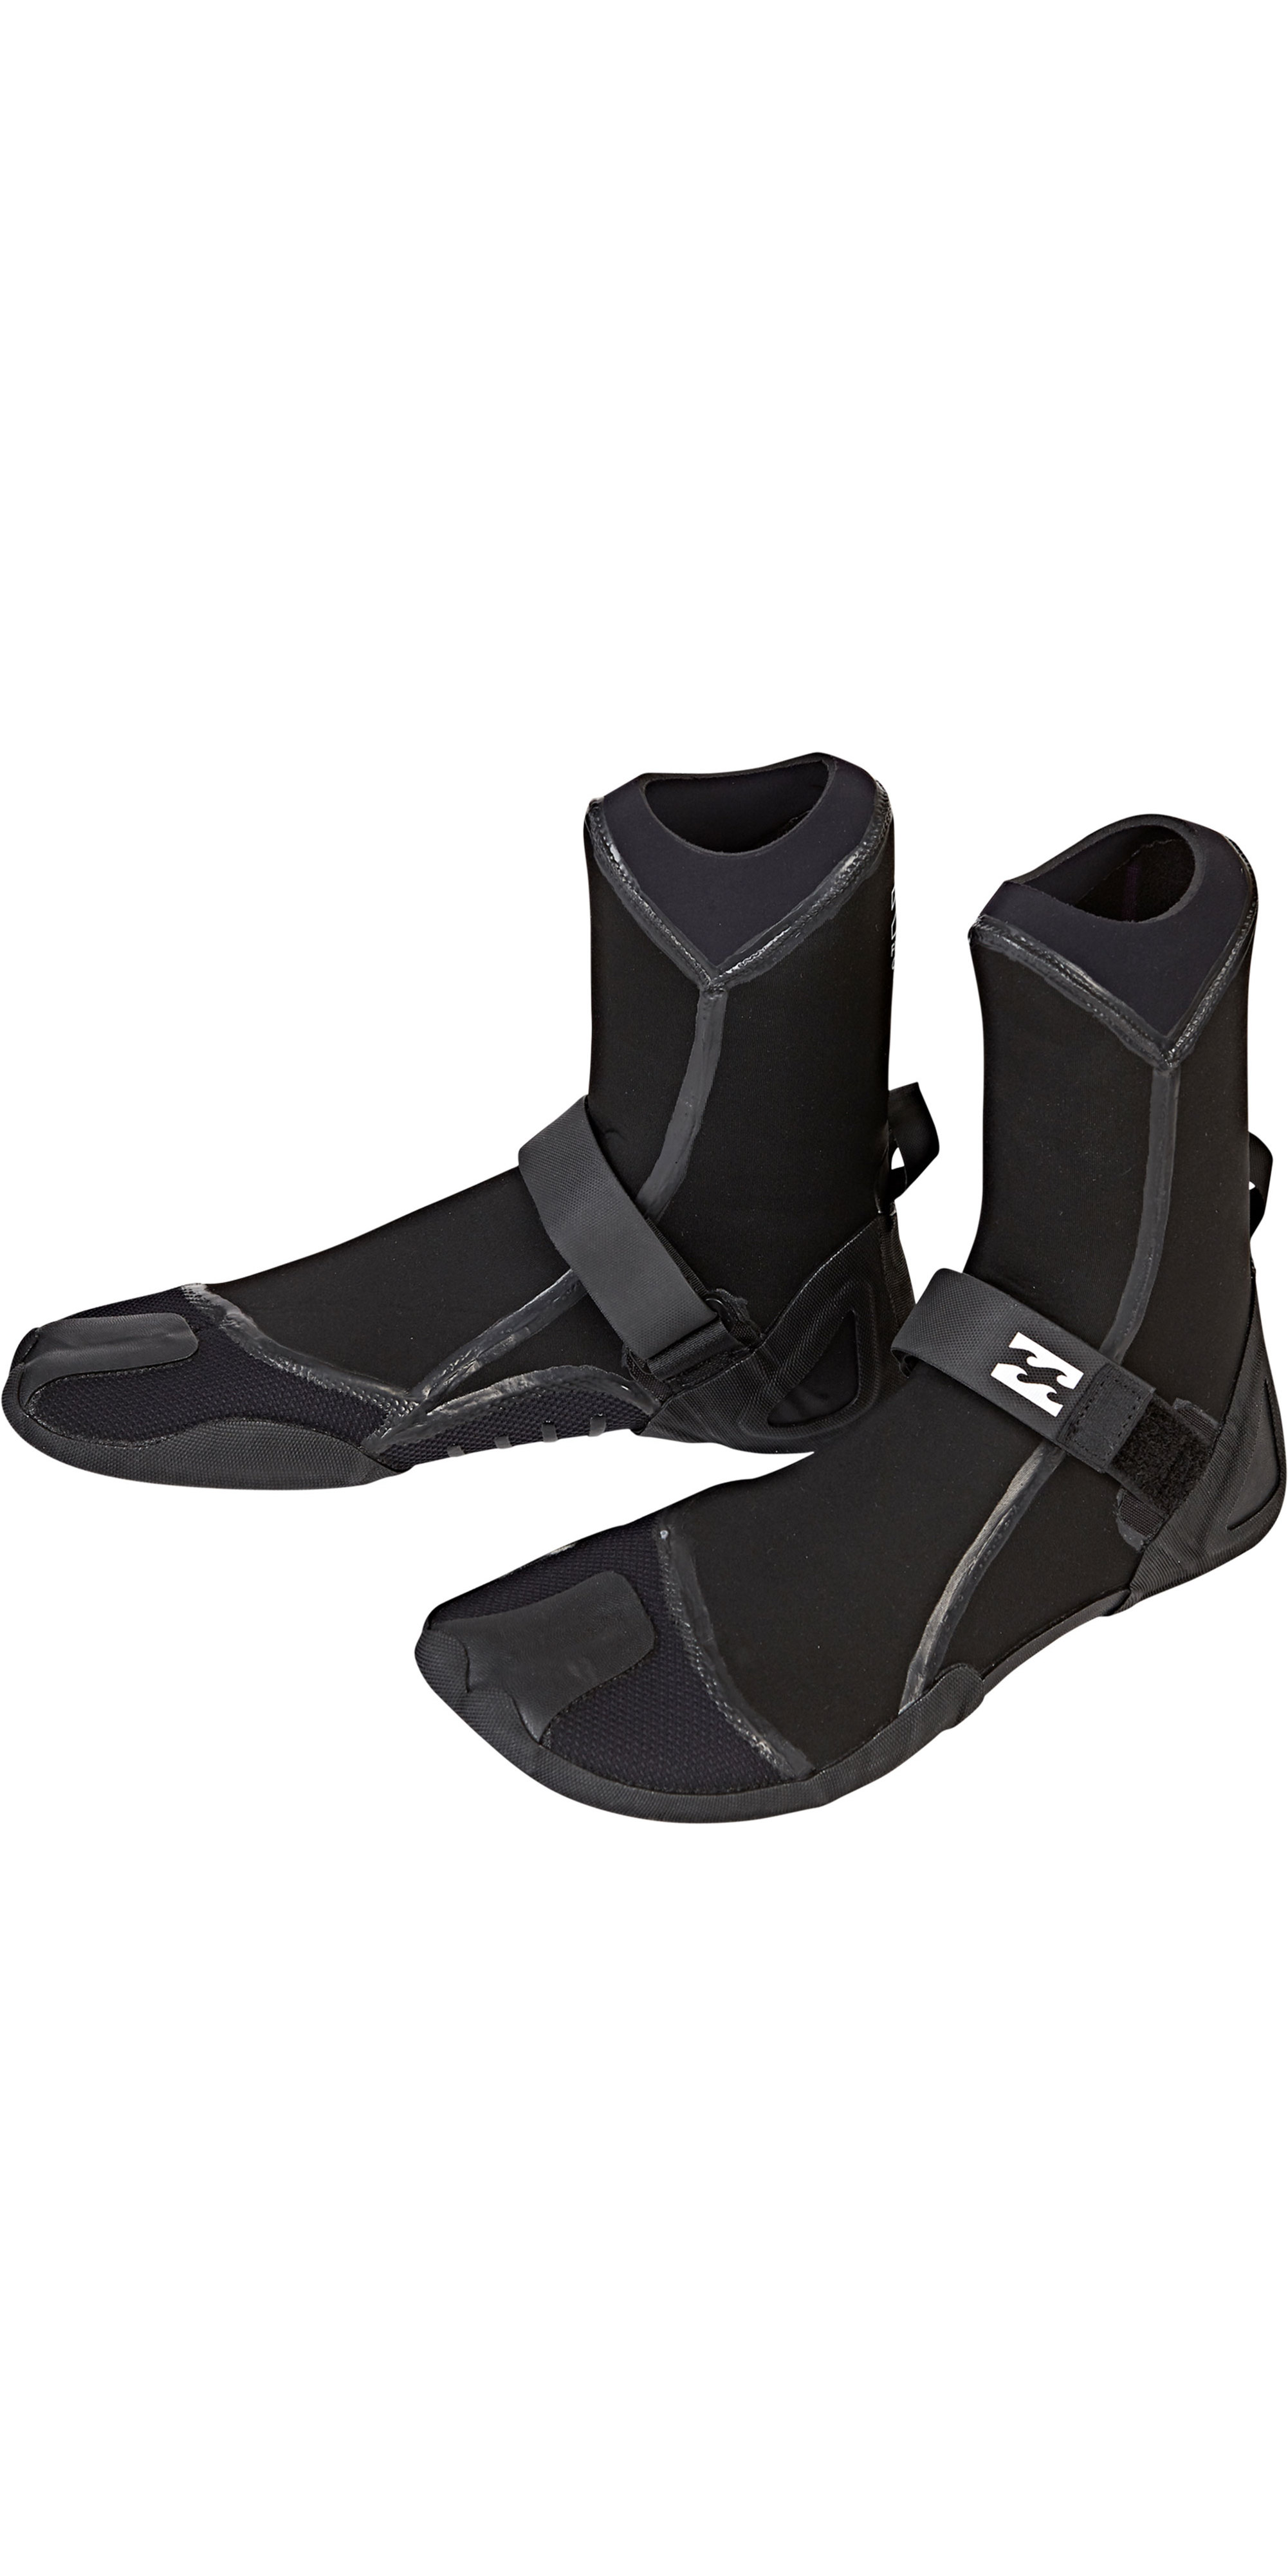 2019 Billabong Furnace Ultra 7mm Split Toe Stiefel Schwarz Q4BT03